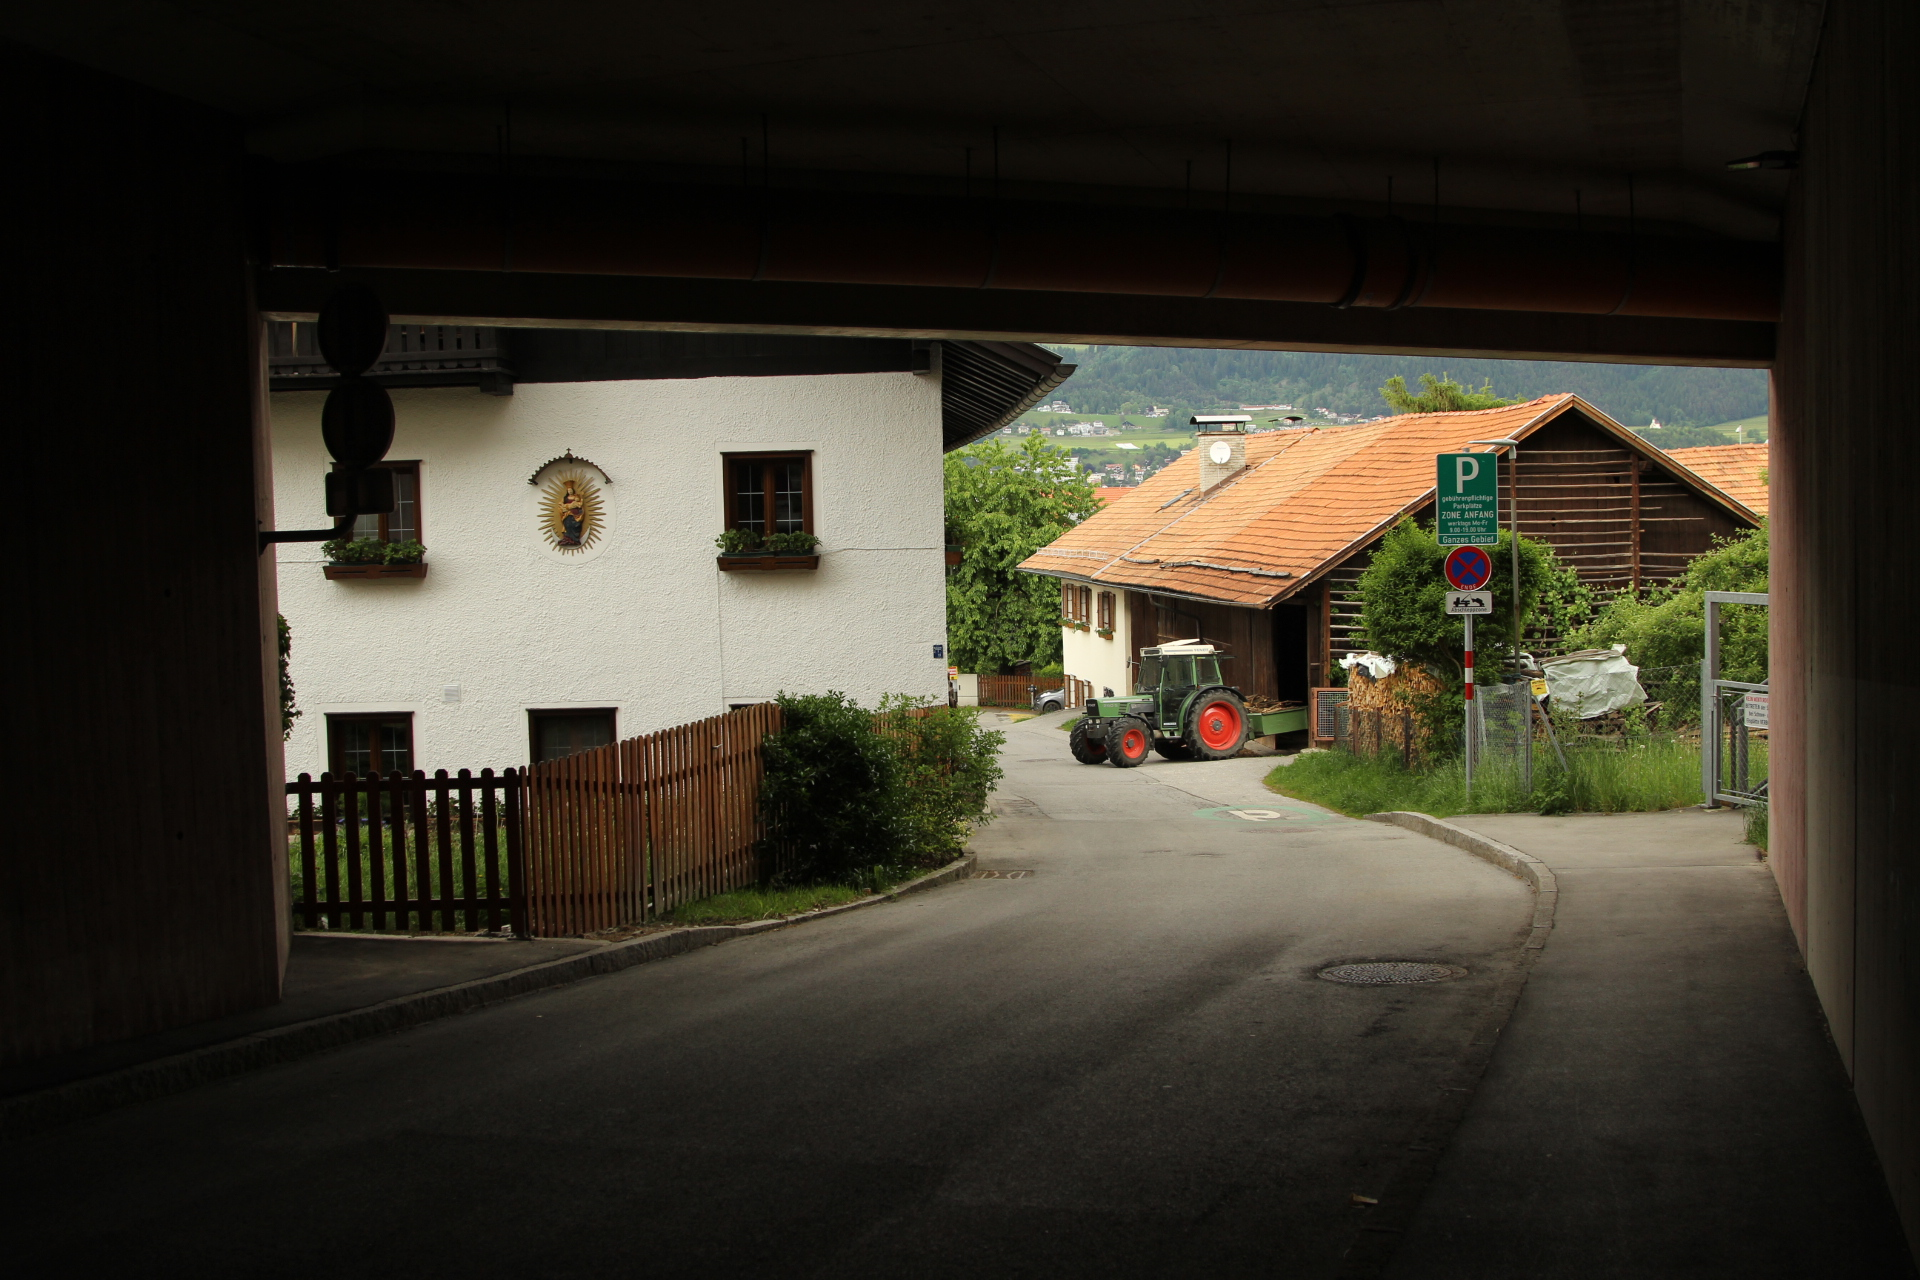 Urban farms are characteristic of the Innsbruck suburbs